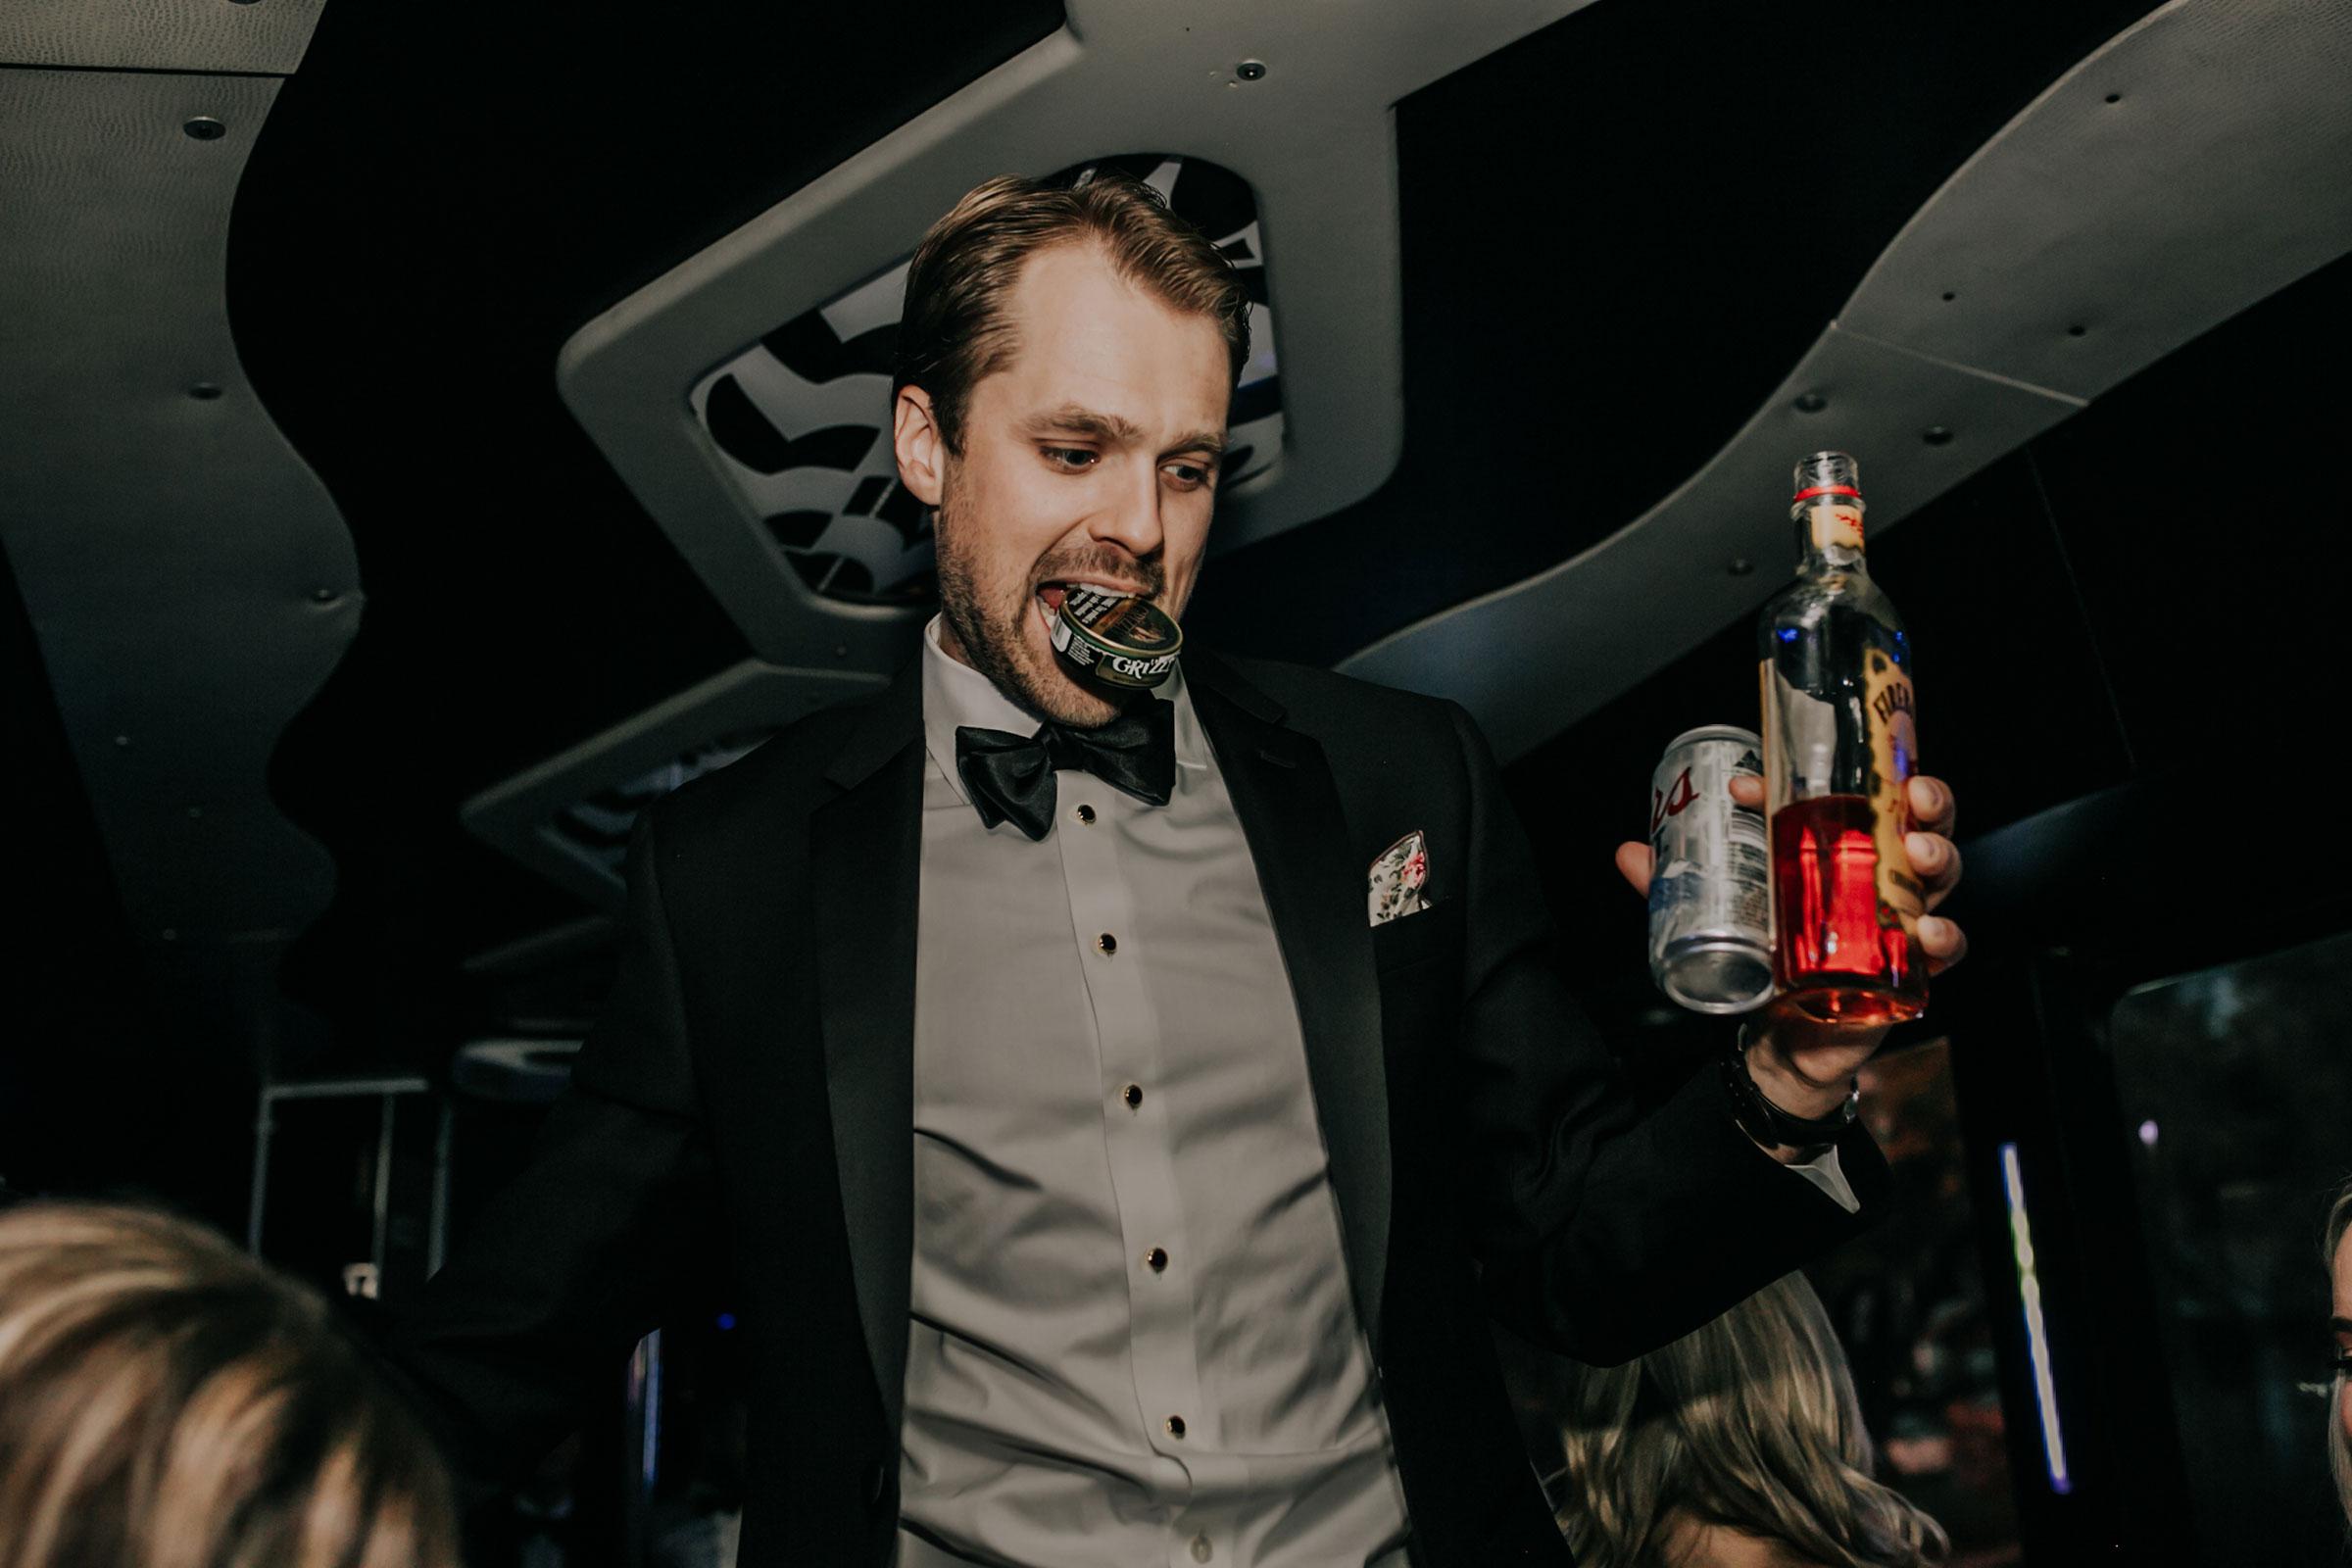 groomsmen-holding-fireball-chew-on-party-bus-omaha-nebraska-raelyn-ramey-photography.jpg